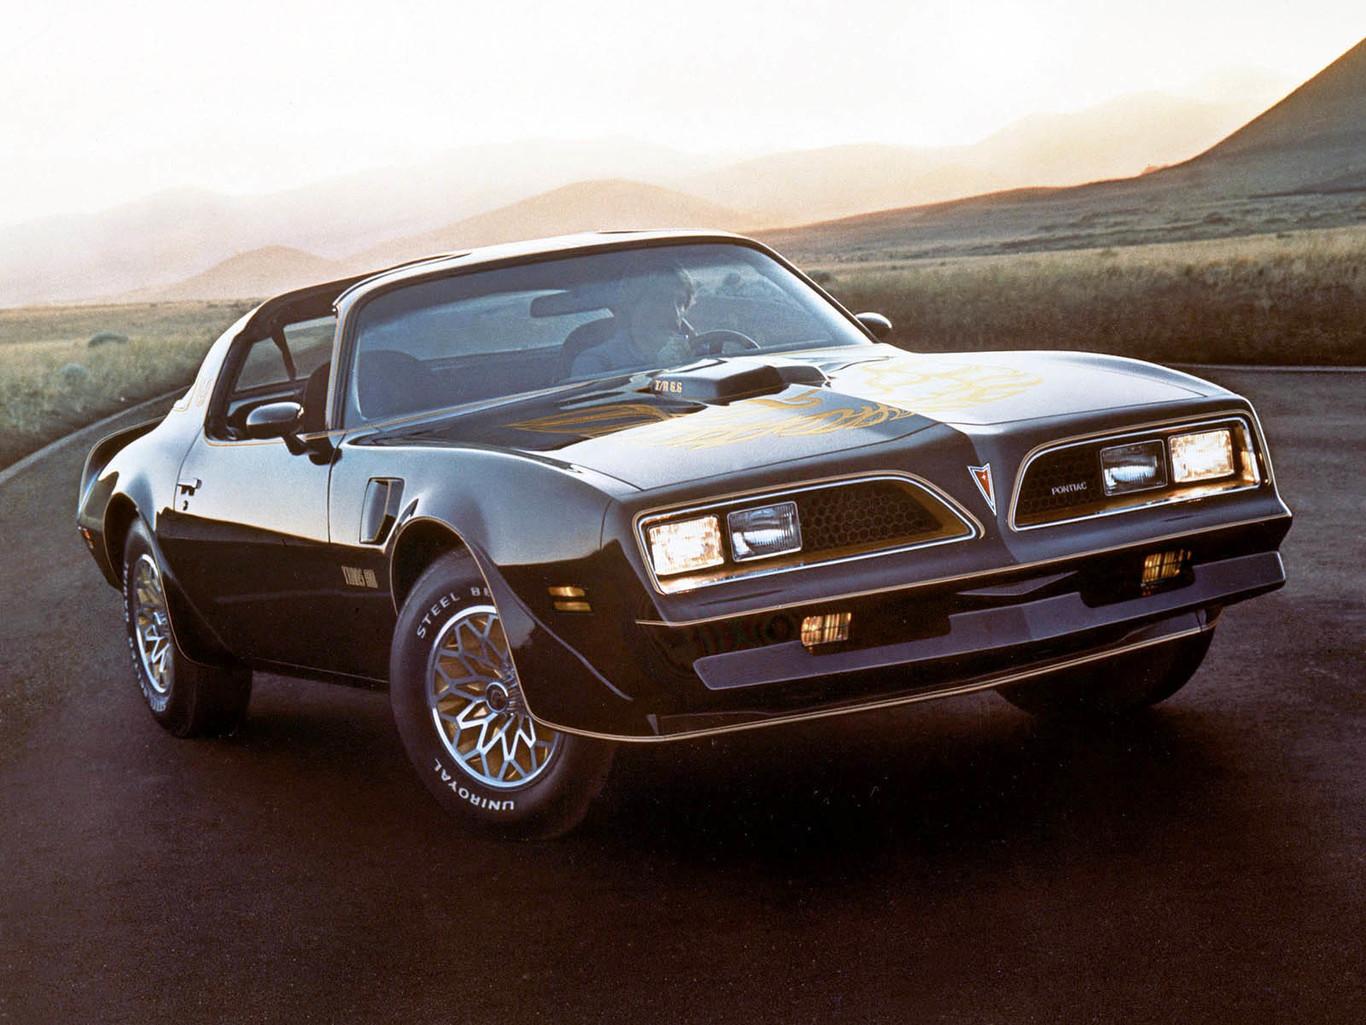 2021 Pontiac Trans Spesification